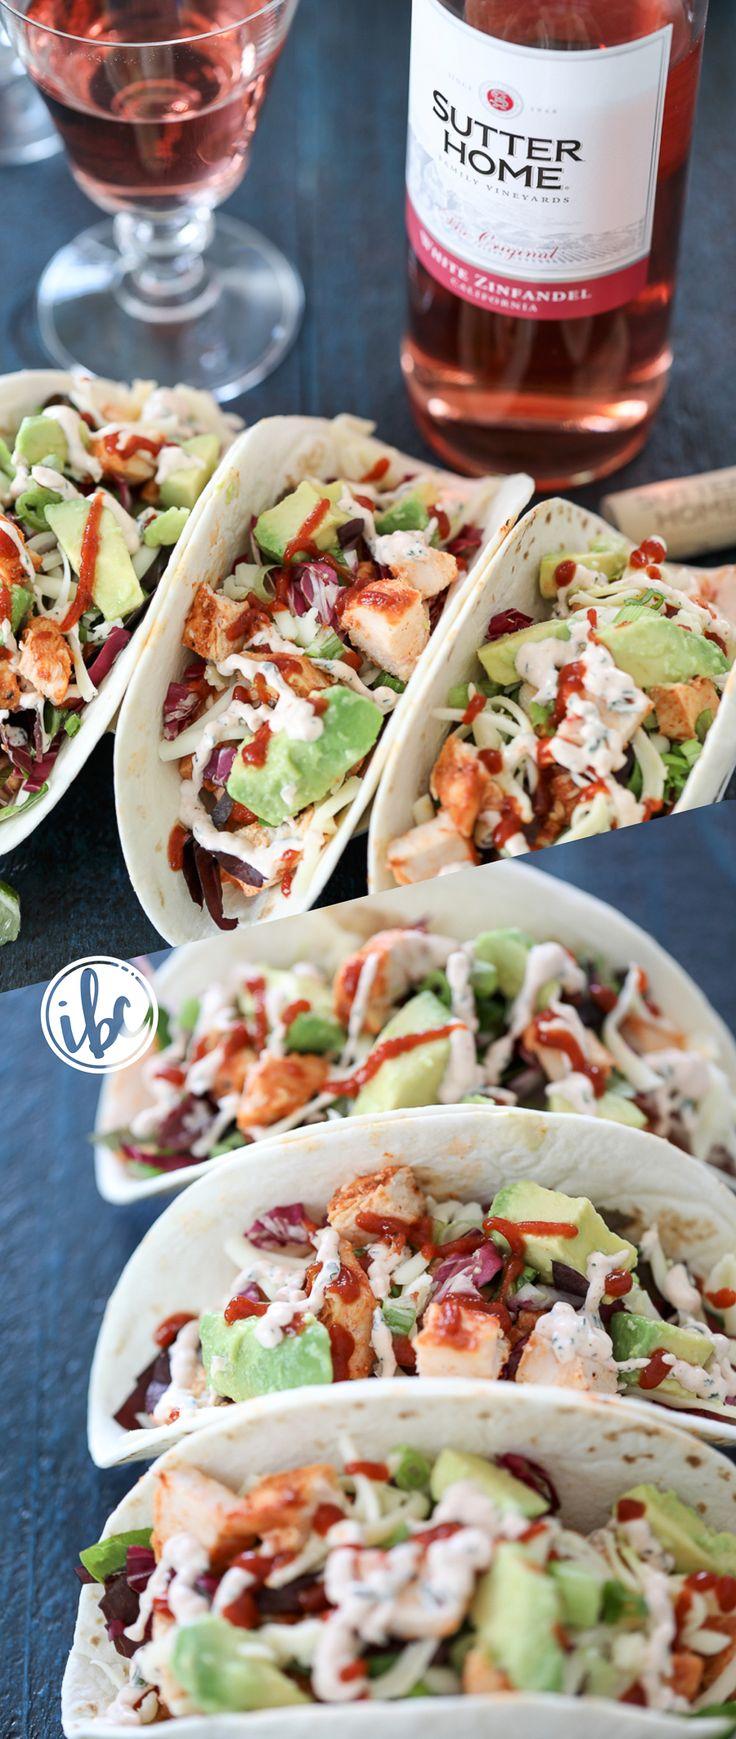 Sriracha Chicken Tacos - Cinco de Mayo - taco tuesday - sriracha recipe - chicken tacos with avocado